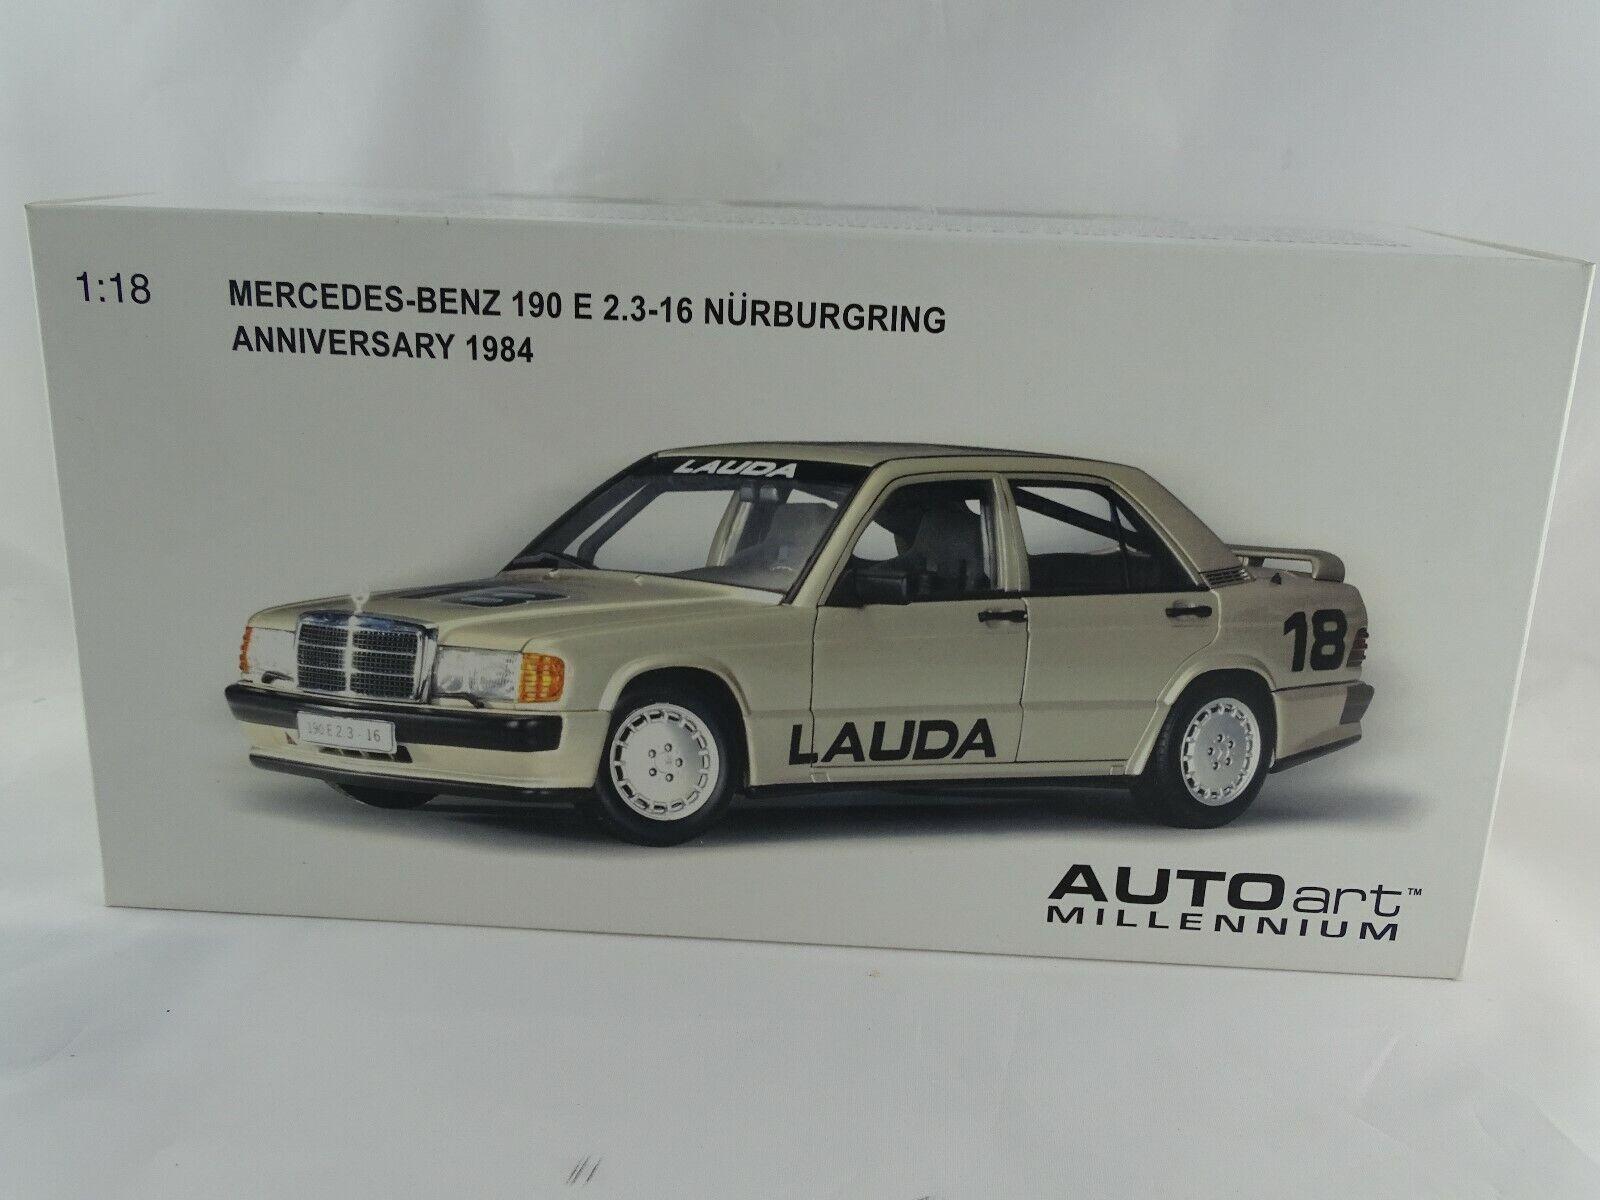 1:18 Autoart 88431 Mercedes-Benz 190 e 2.3-16 Nürburgring 1984 Lauda Raro #18 $